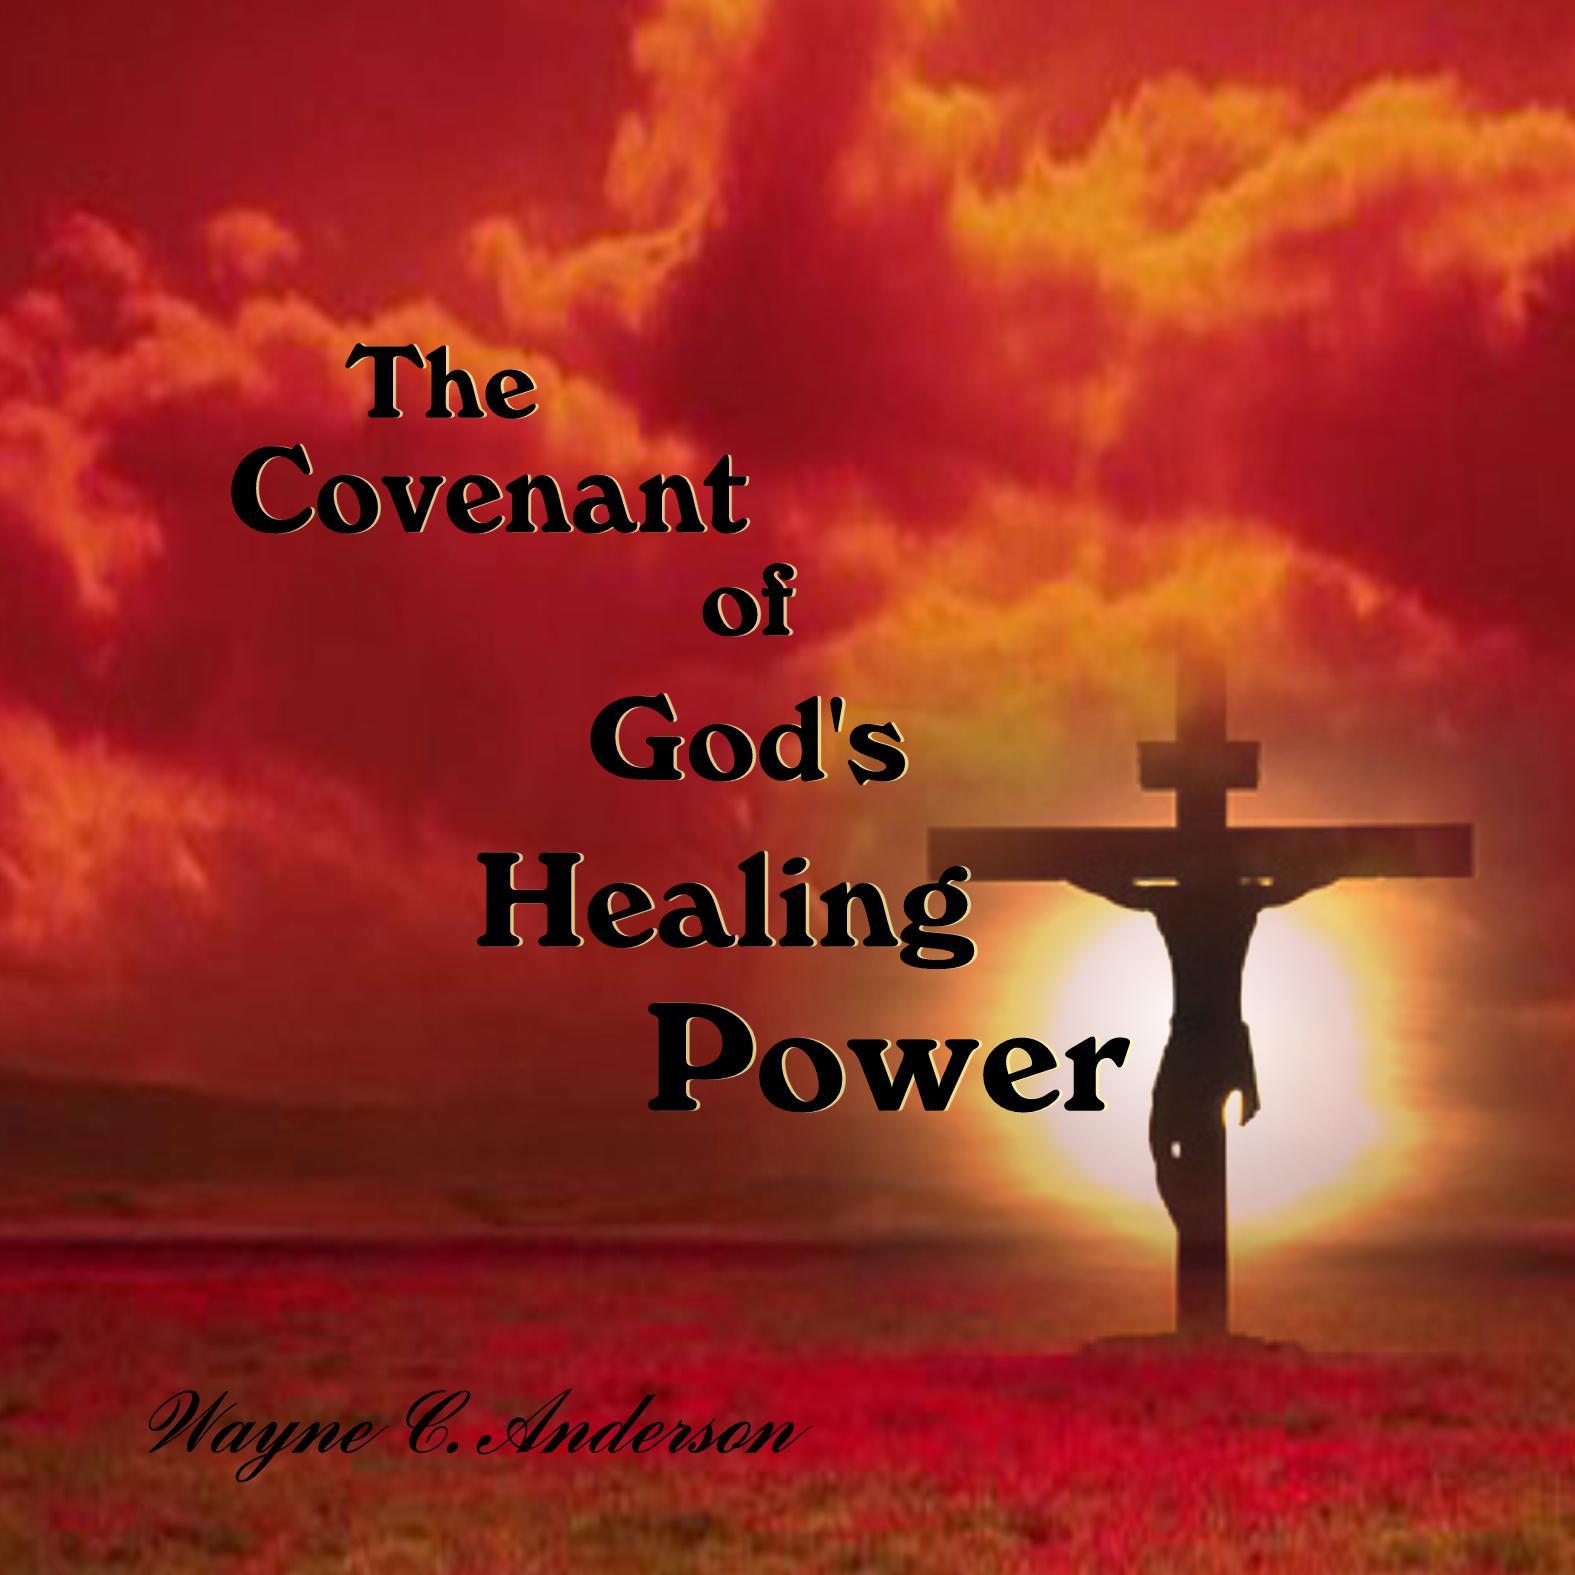 Healing Quotes: Gods Healing Power Quotes. QuotesGram